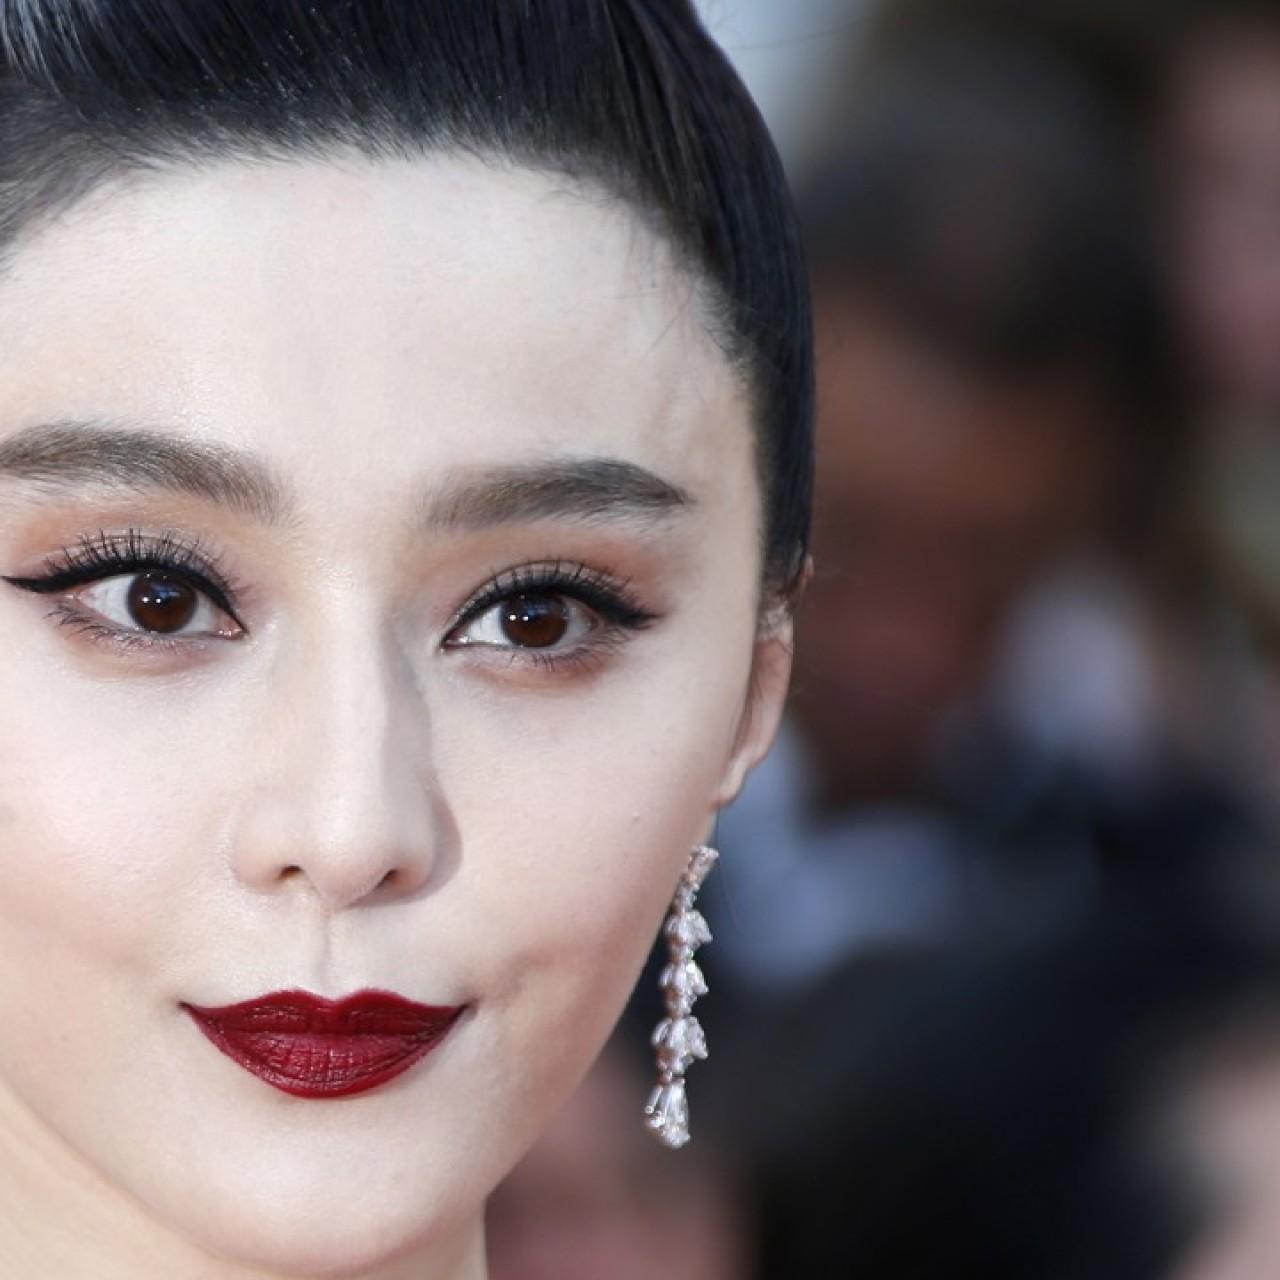 Fan Bingbing tax evasion scandal: four luxury brands caught